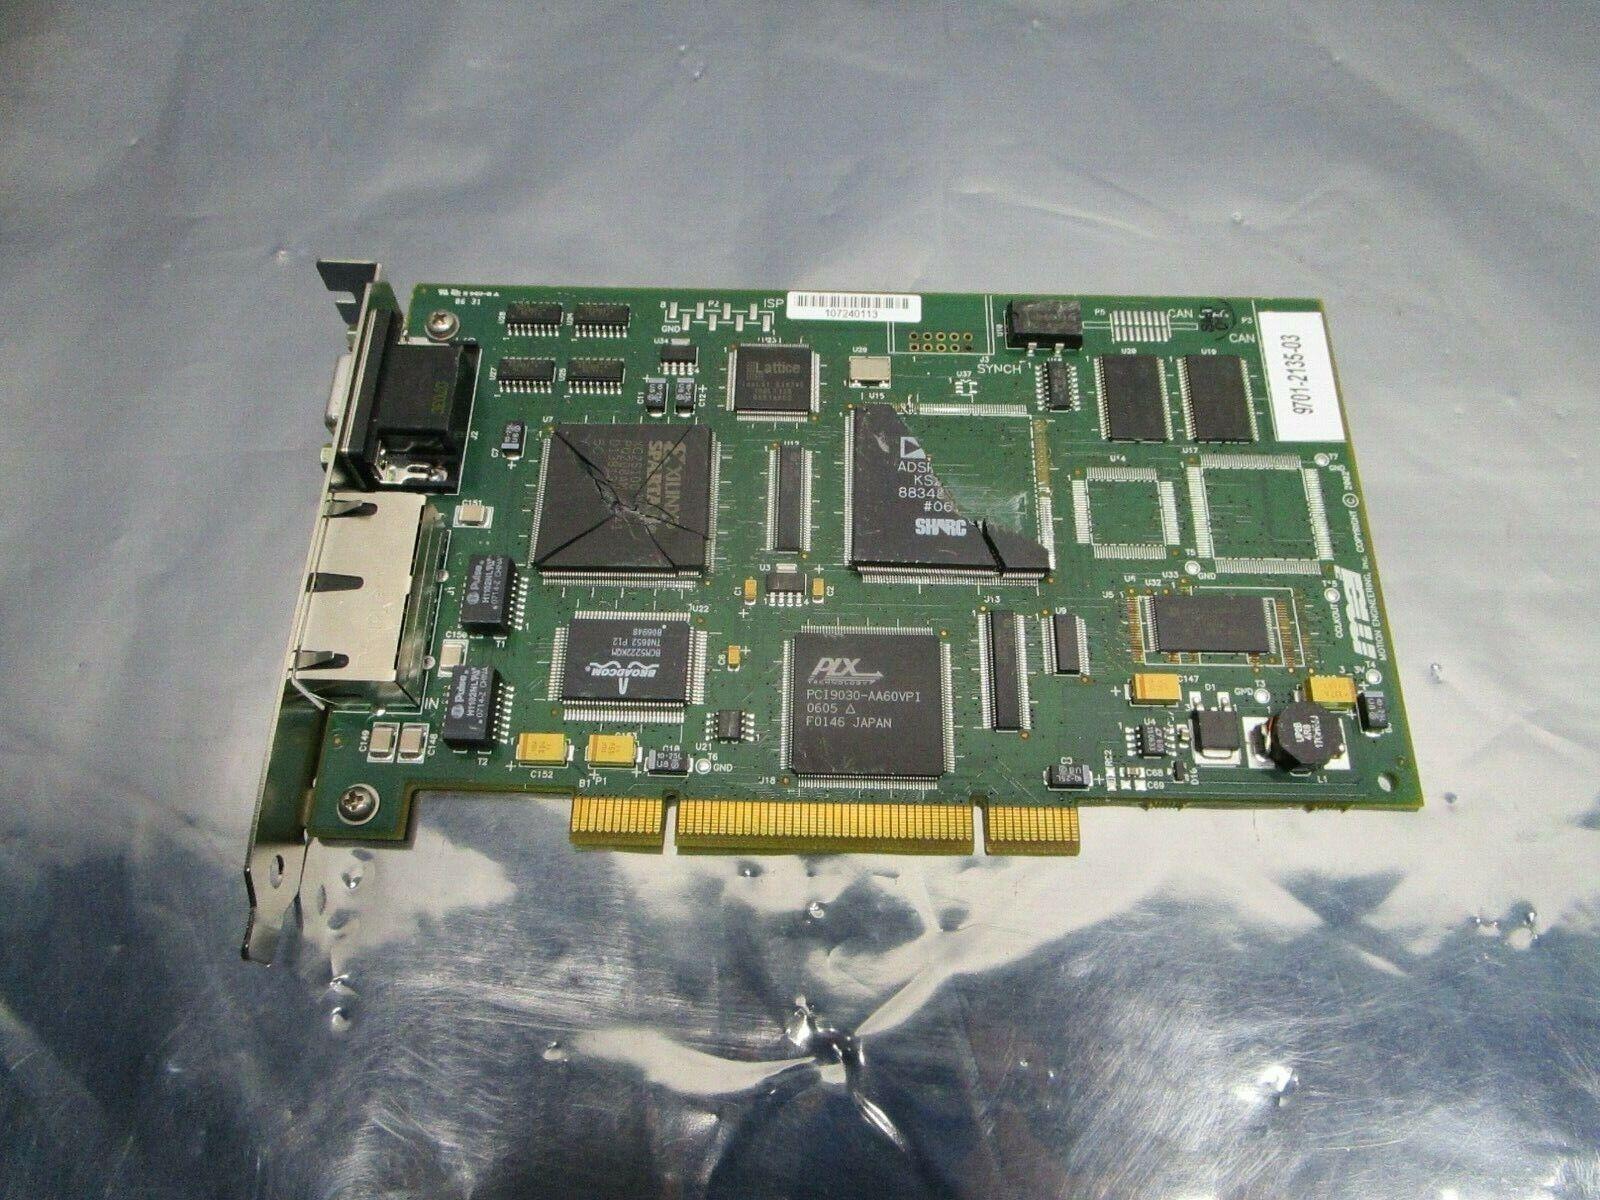 MEI 9701-2135-03 PCB, Asyst, 1107-0085, XMP-SYNQNET-PCI-RJ, 101204